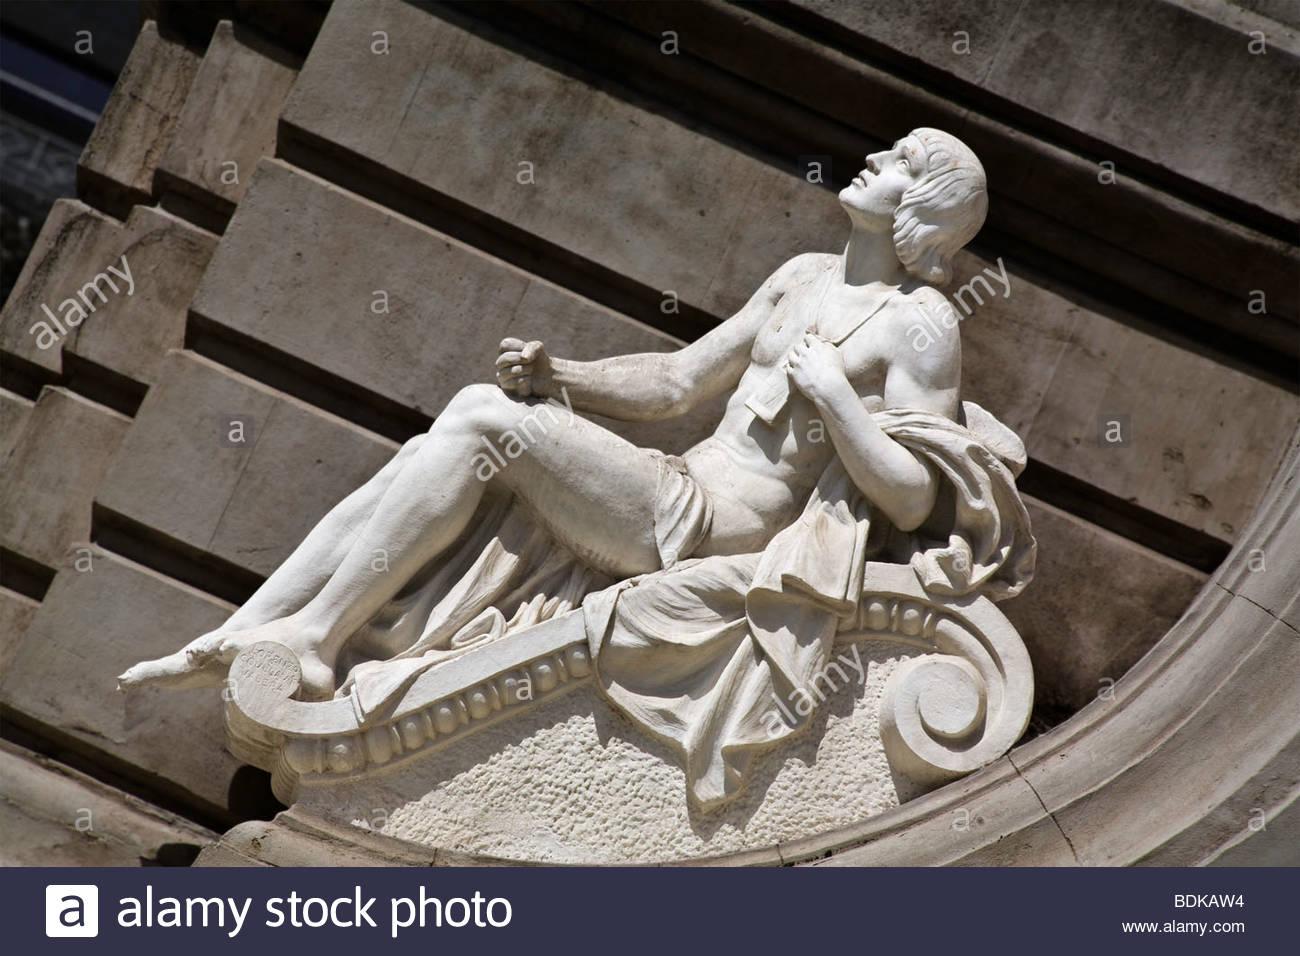 'Mysticism', Madrid, Spain, - Stock Image